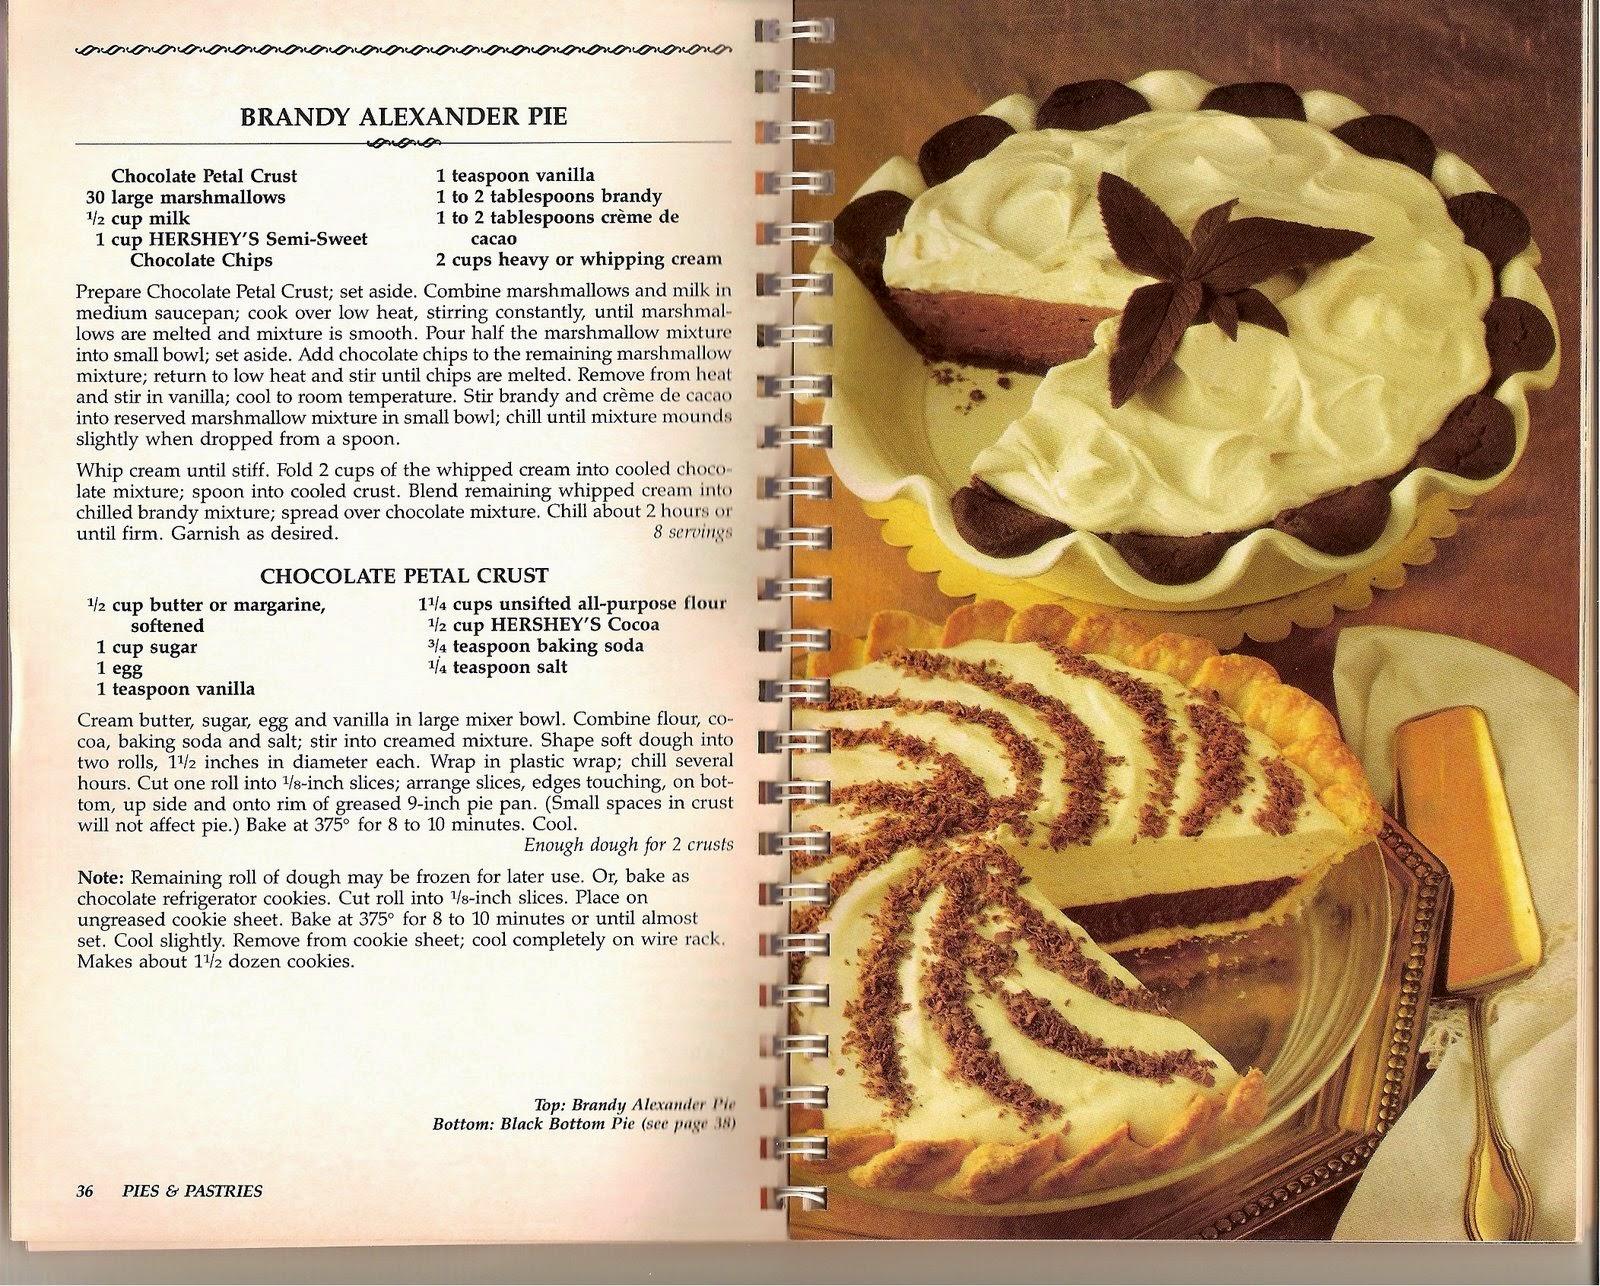 http://grammy-alimentatorecipes.blogspot.com/2009/02/brandy-alexander-pie-chocolate-petal.html